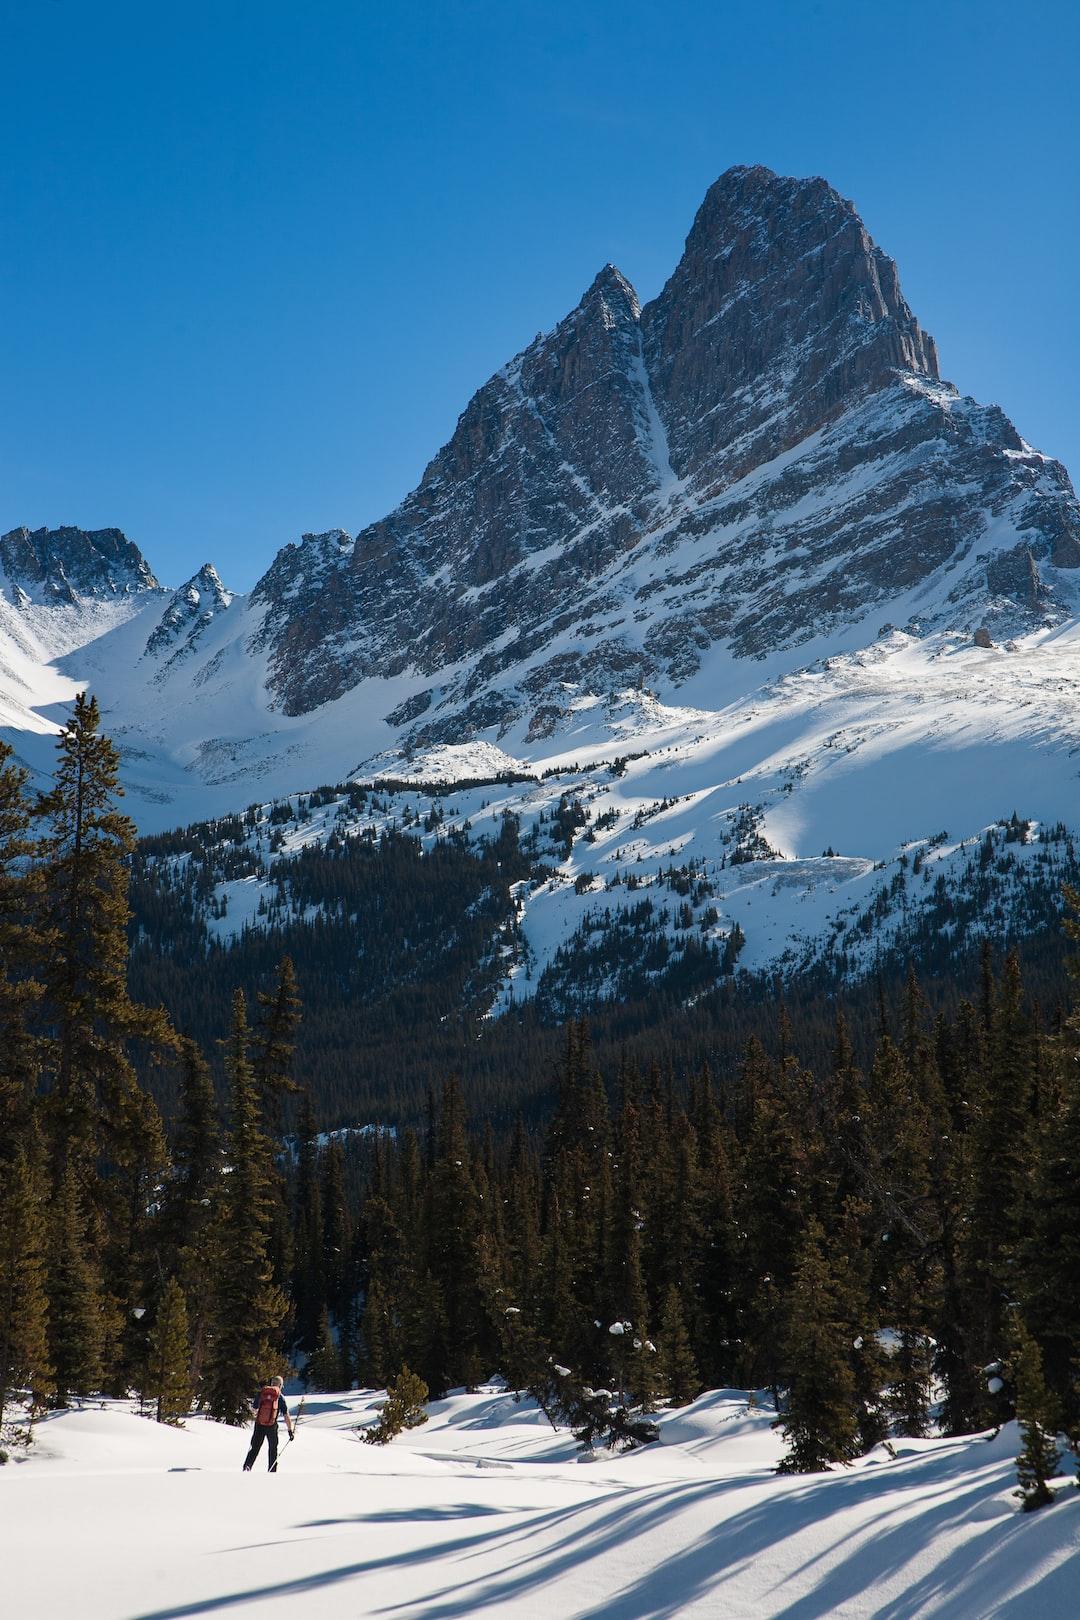 A 35km ski tour in the backcountry of Jasper National Park. Tonquin Valley, Jasper Alberta.